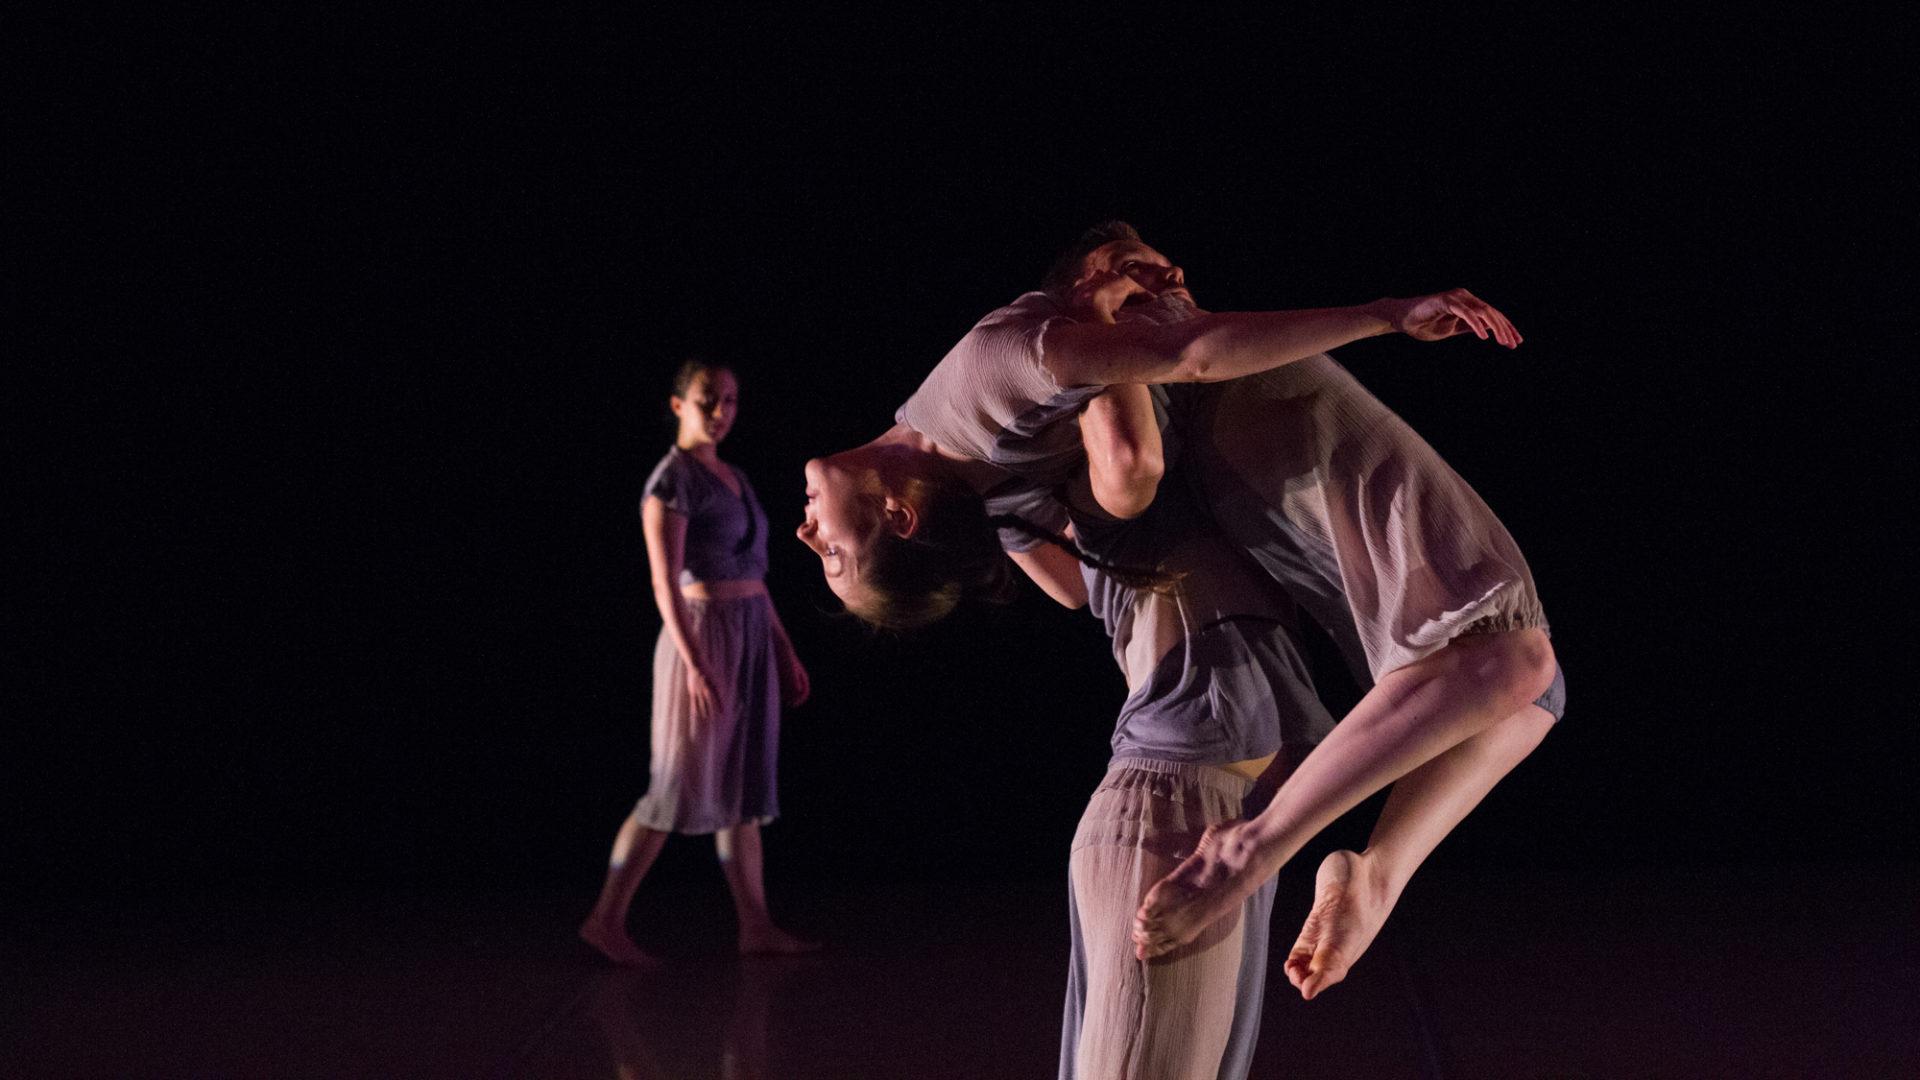 caitlin+dancers